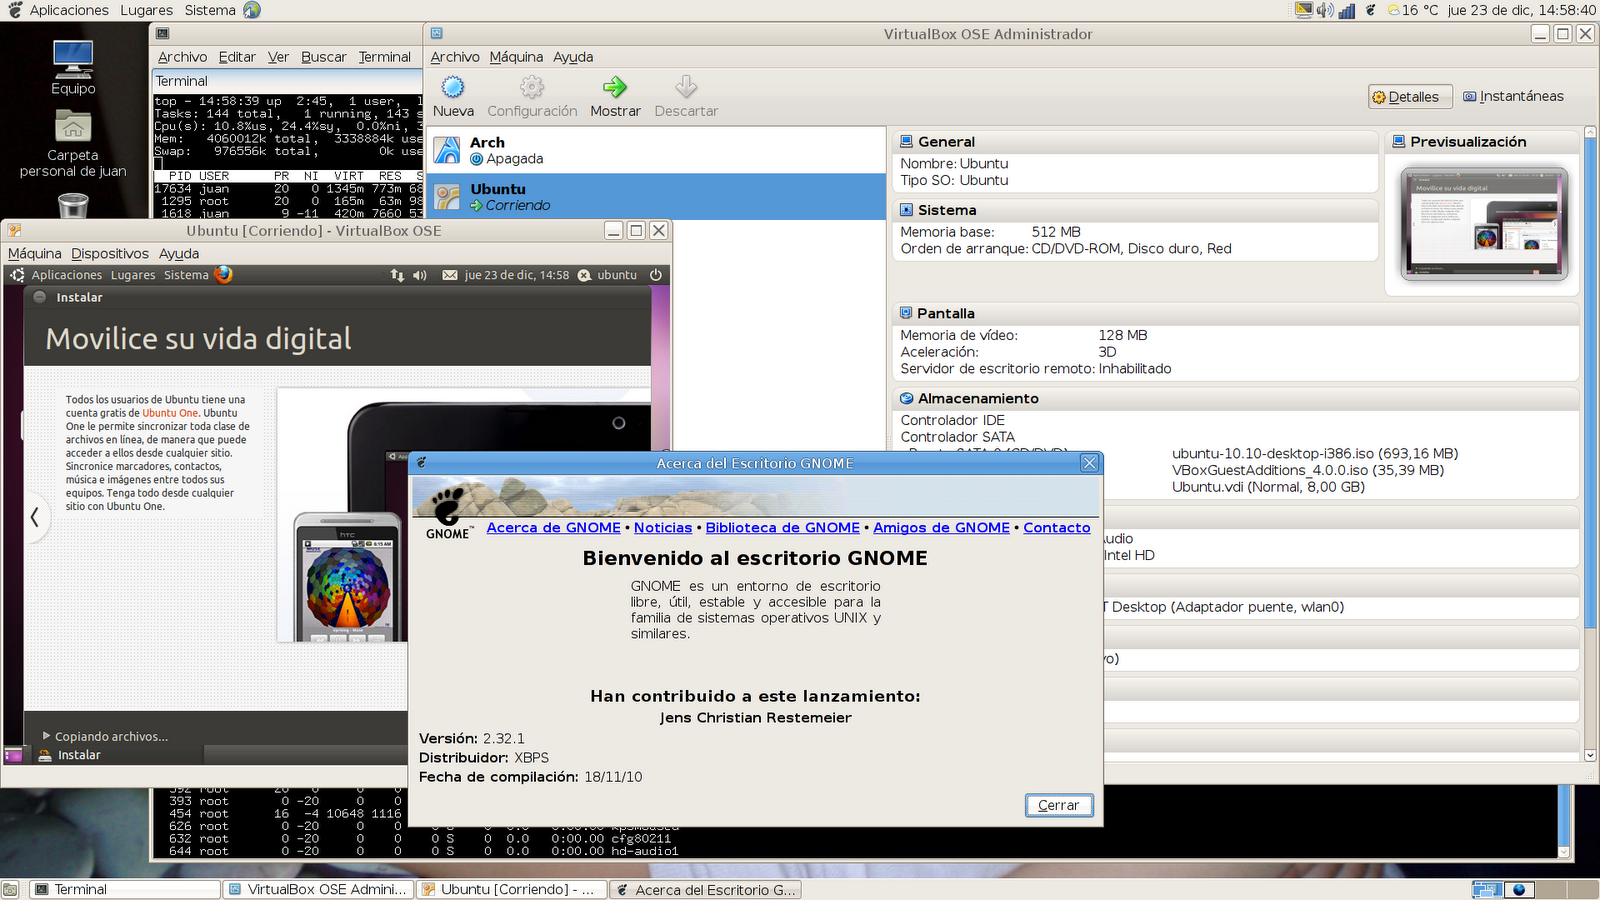 gdk-pixbuf 2.26.0